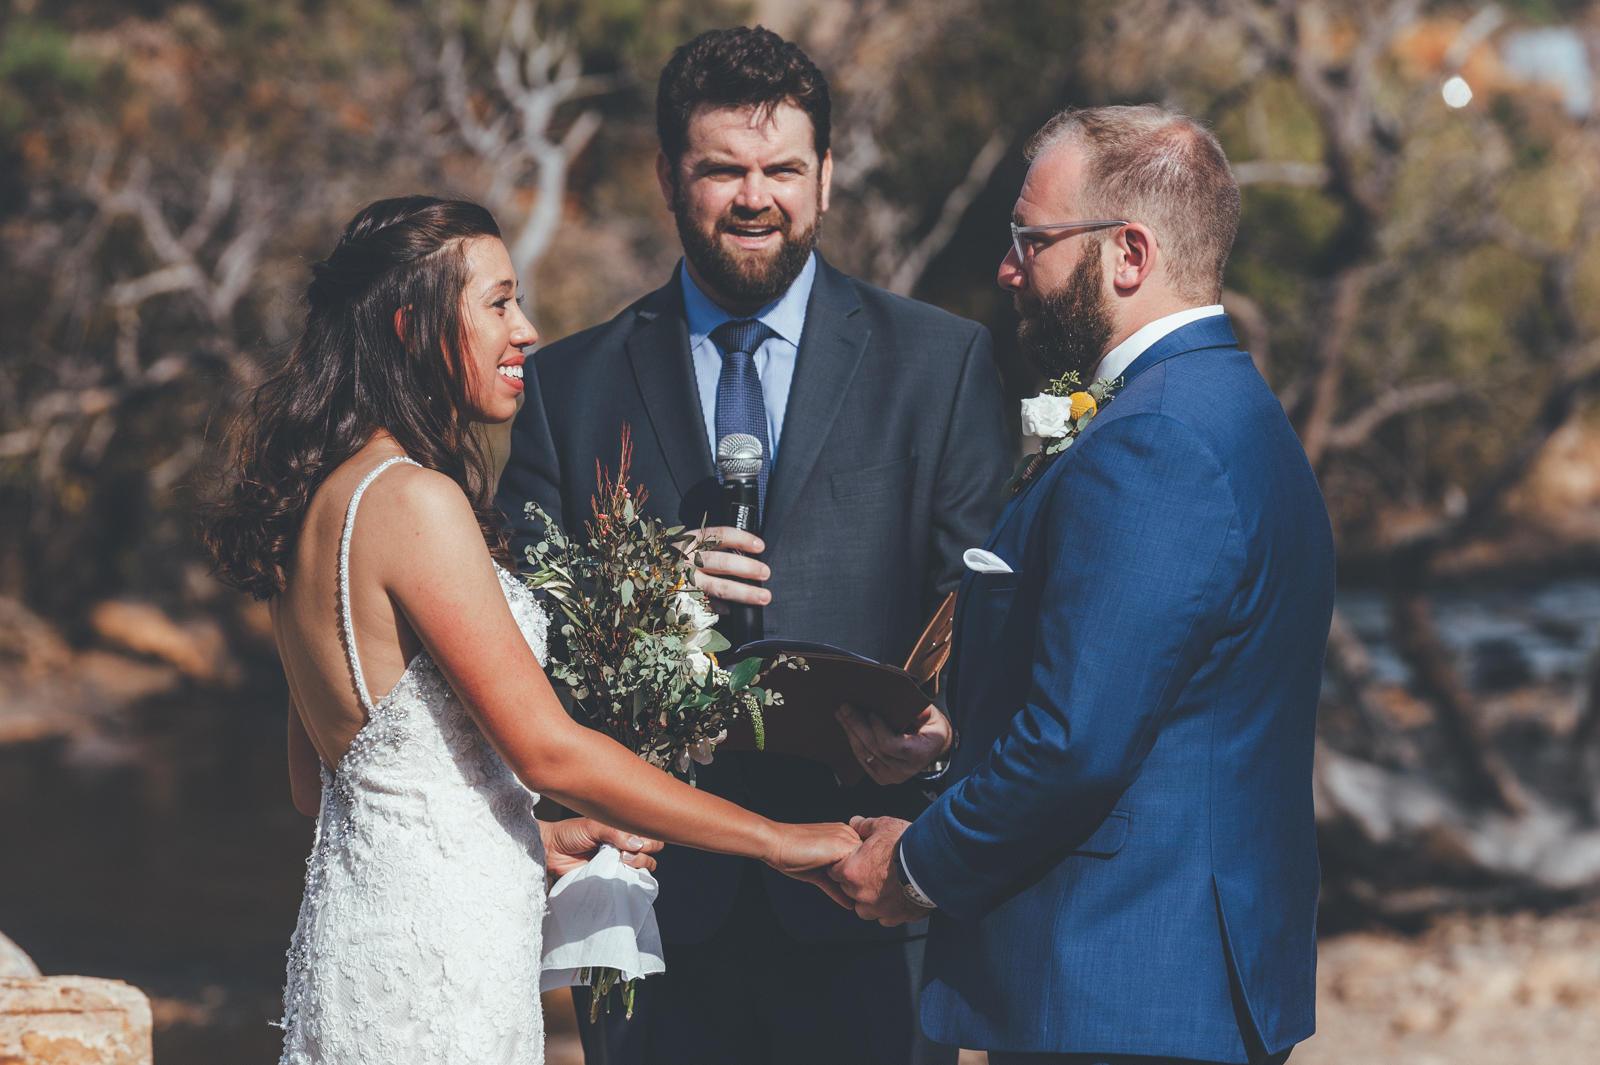 ChadFahnestockPhotography-estes-park-wedding-photography-018.jpg